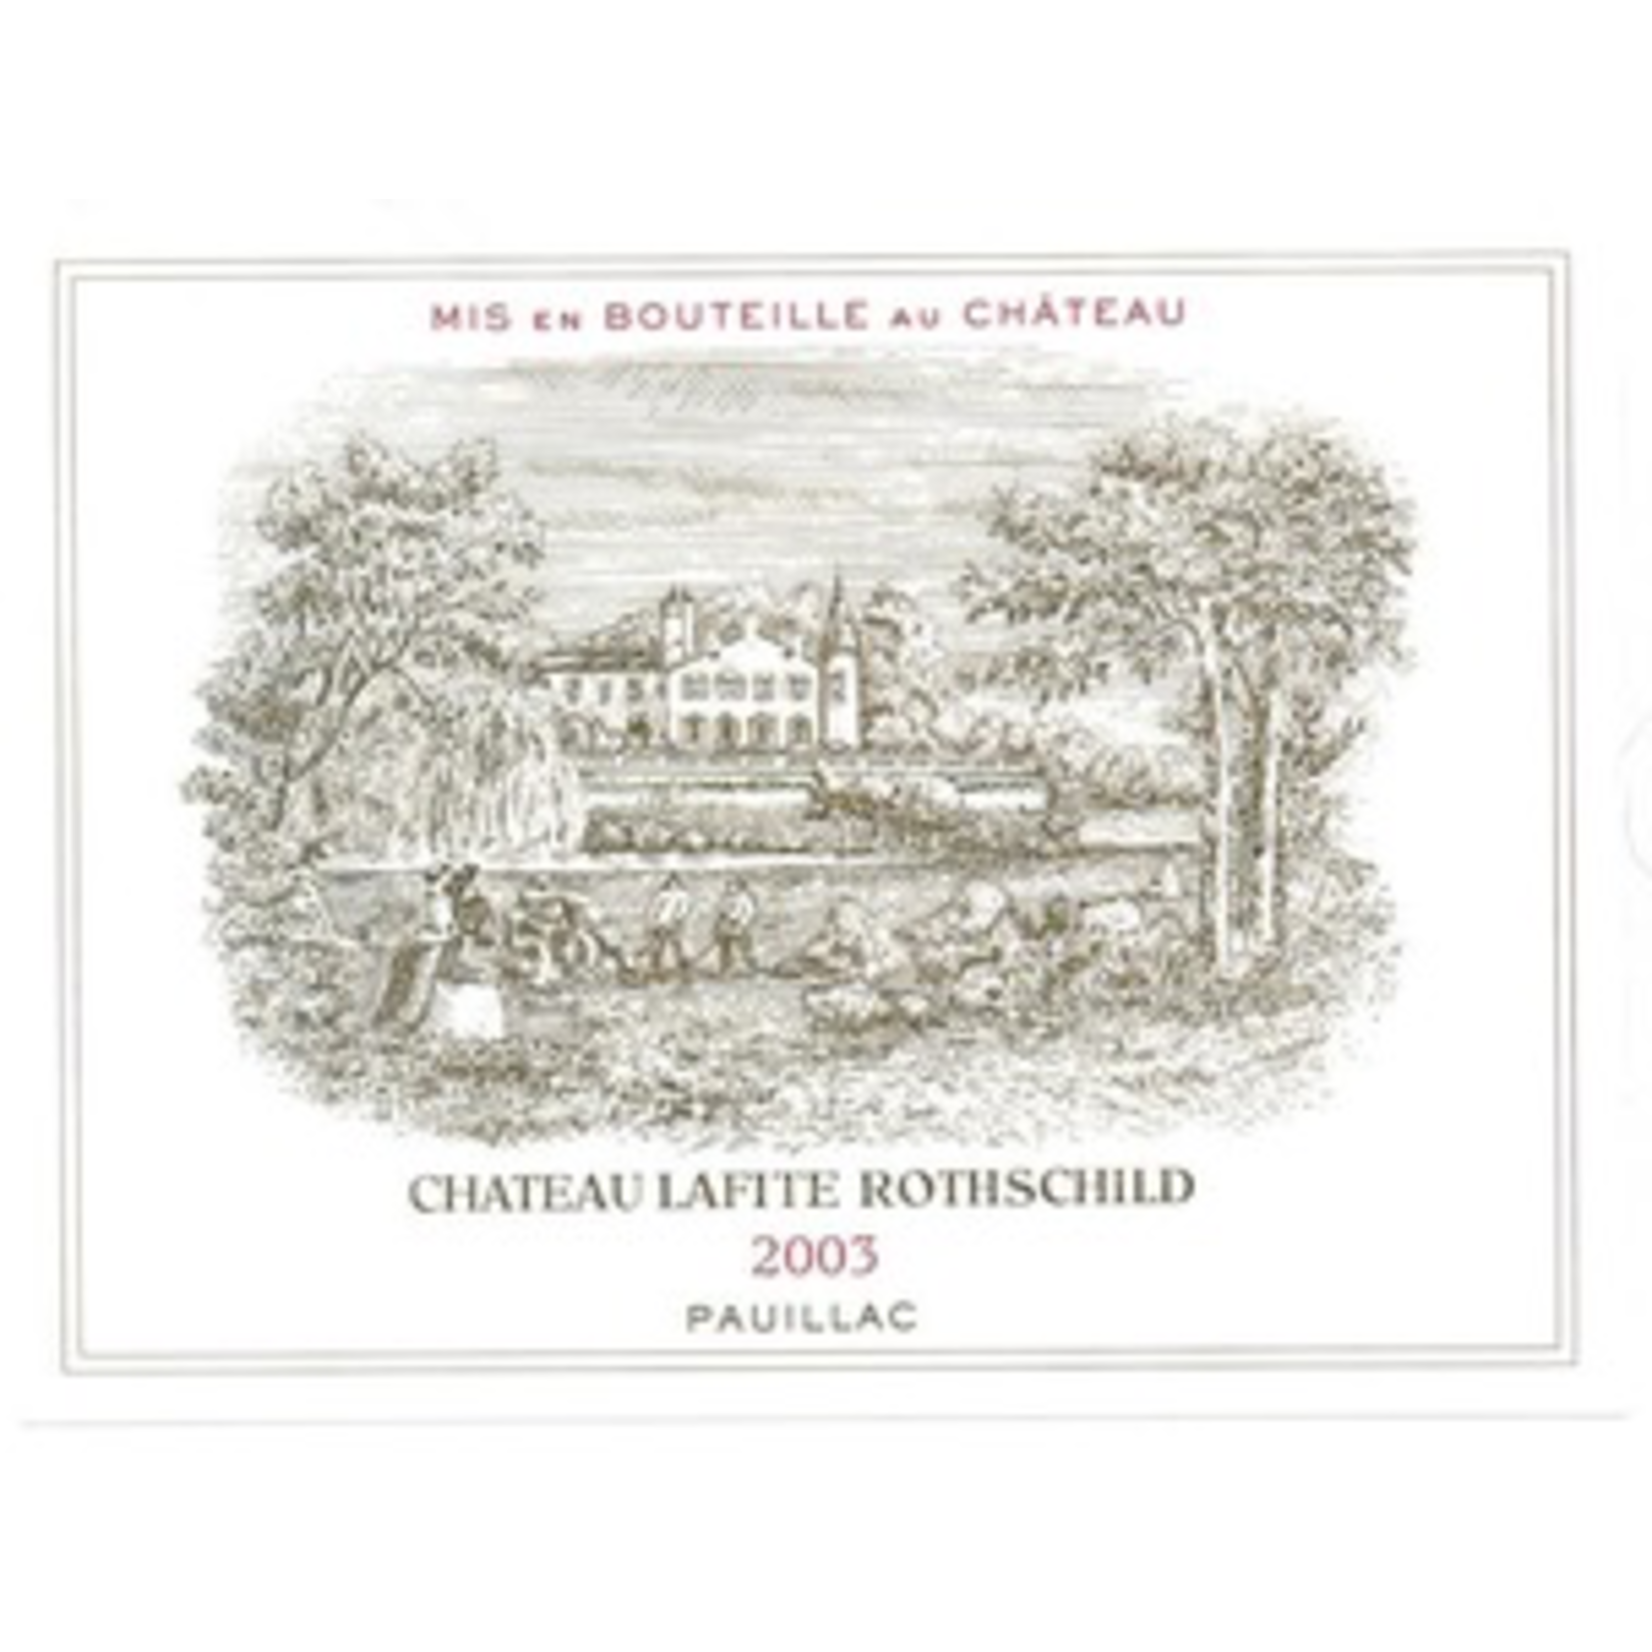 Wine Chateau Lafite Rothschild 2003